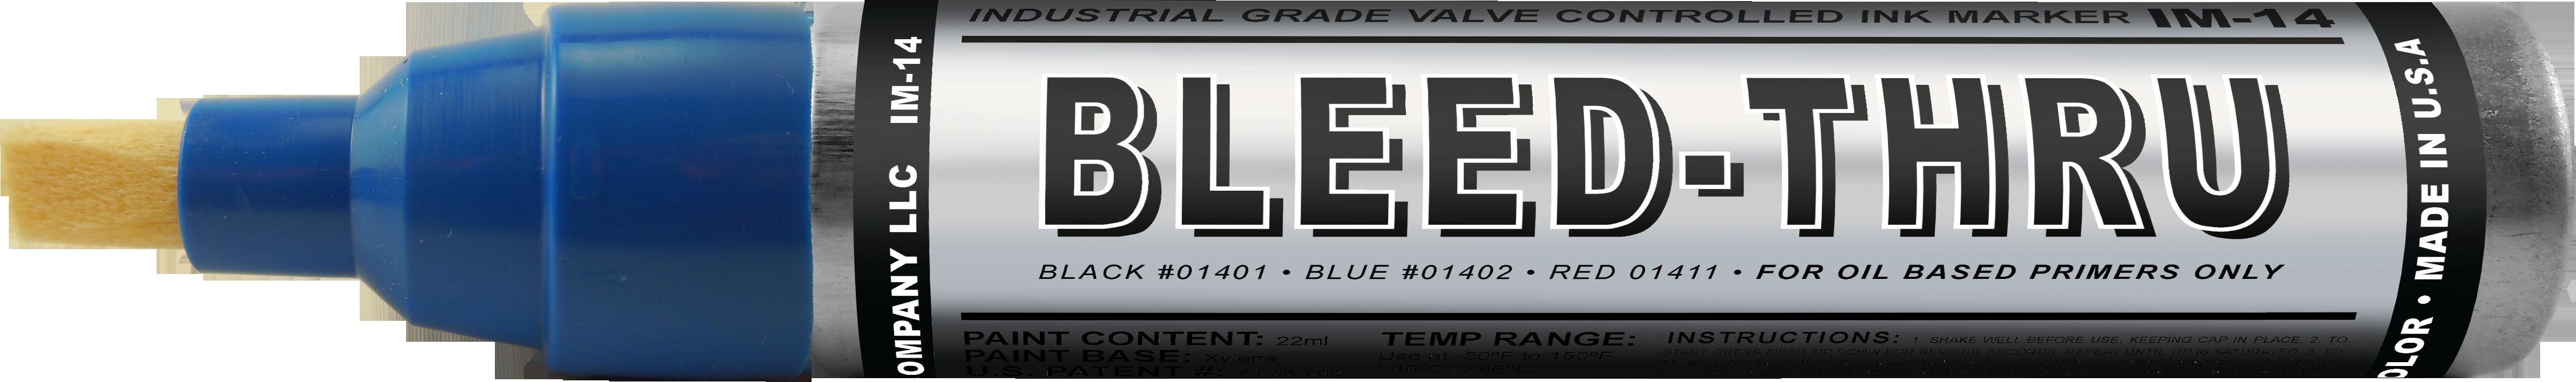 Bleed-Thru Markers